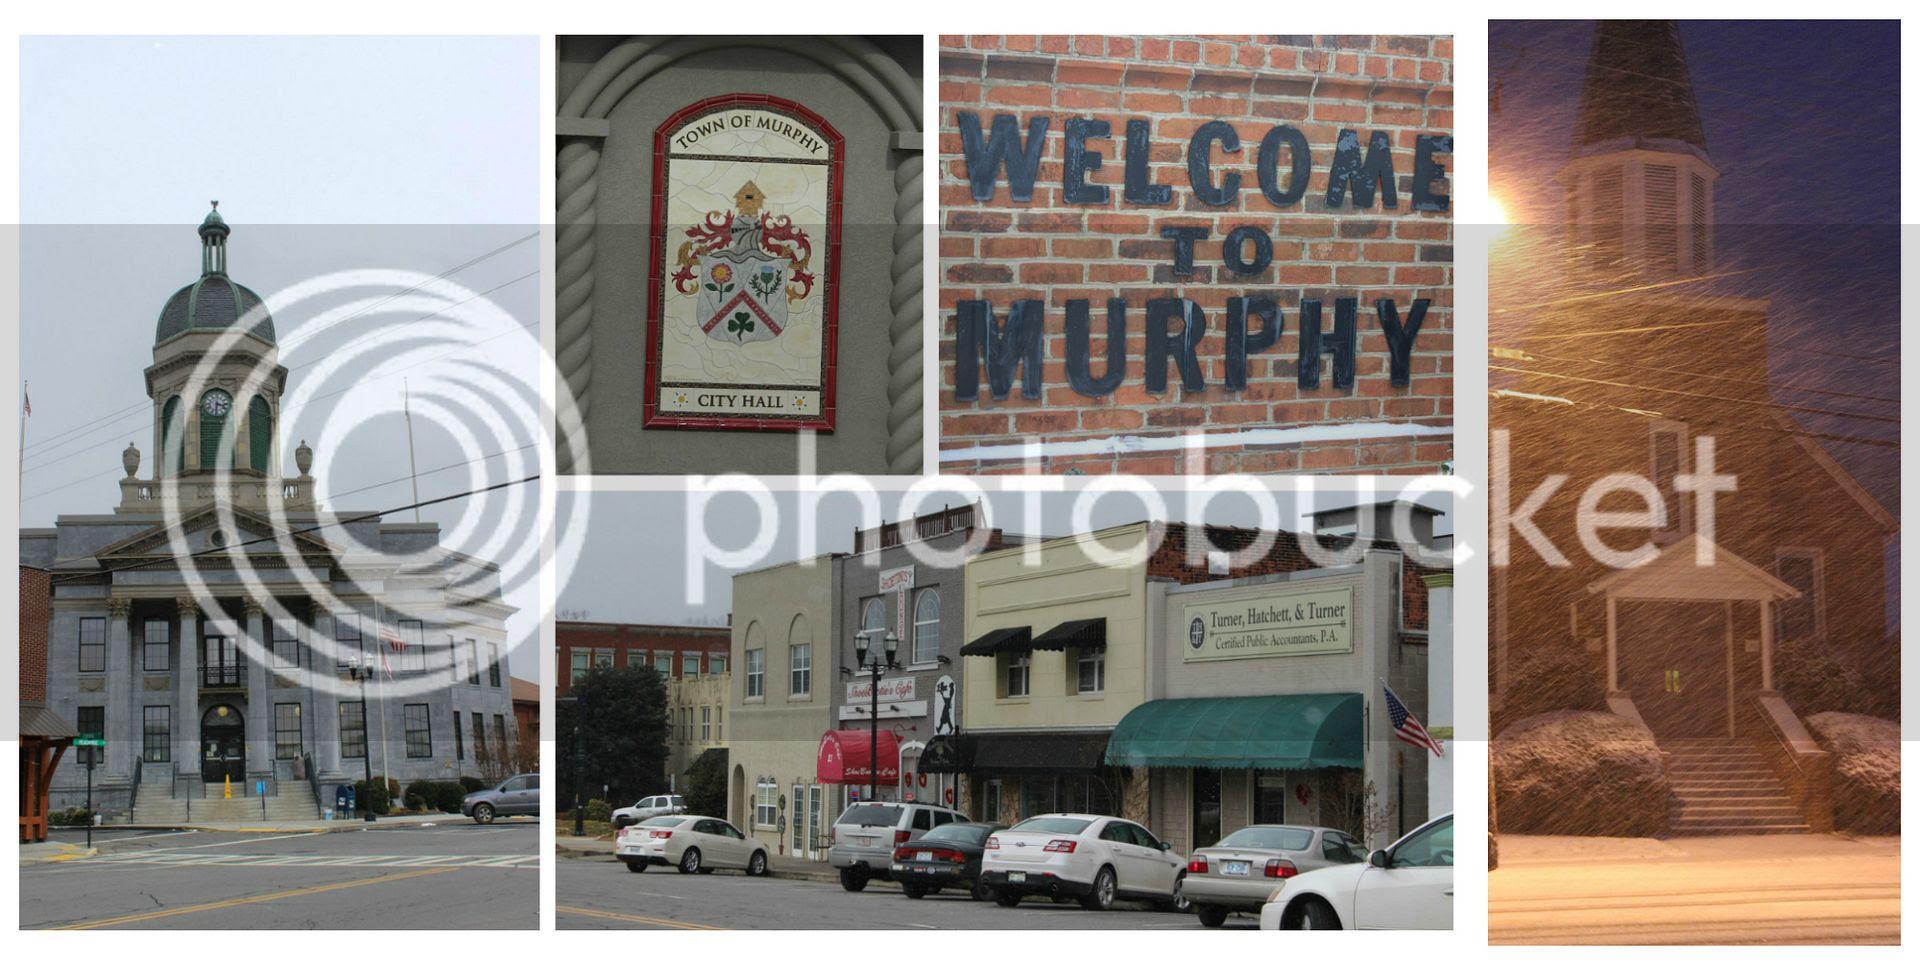 photo murphy.collage1_zpsedblpdgs.jpg